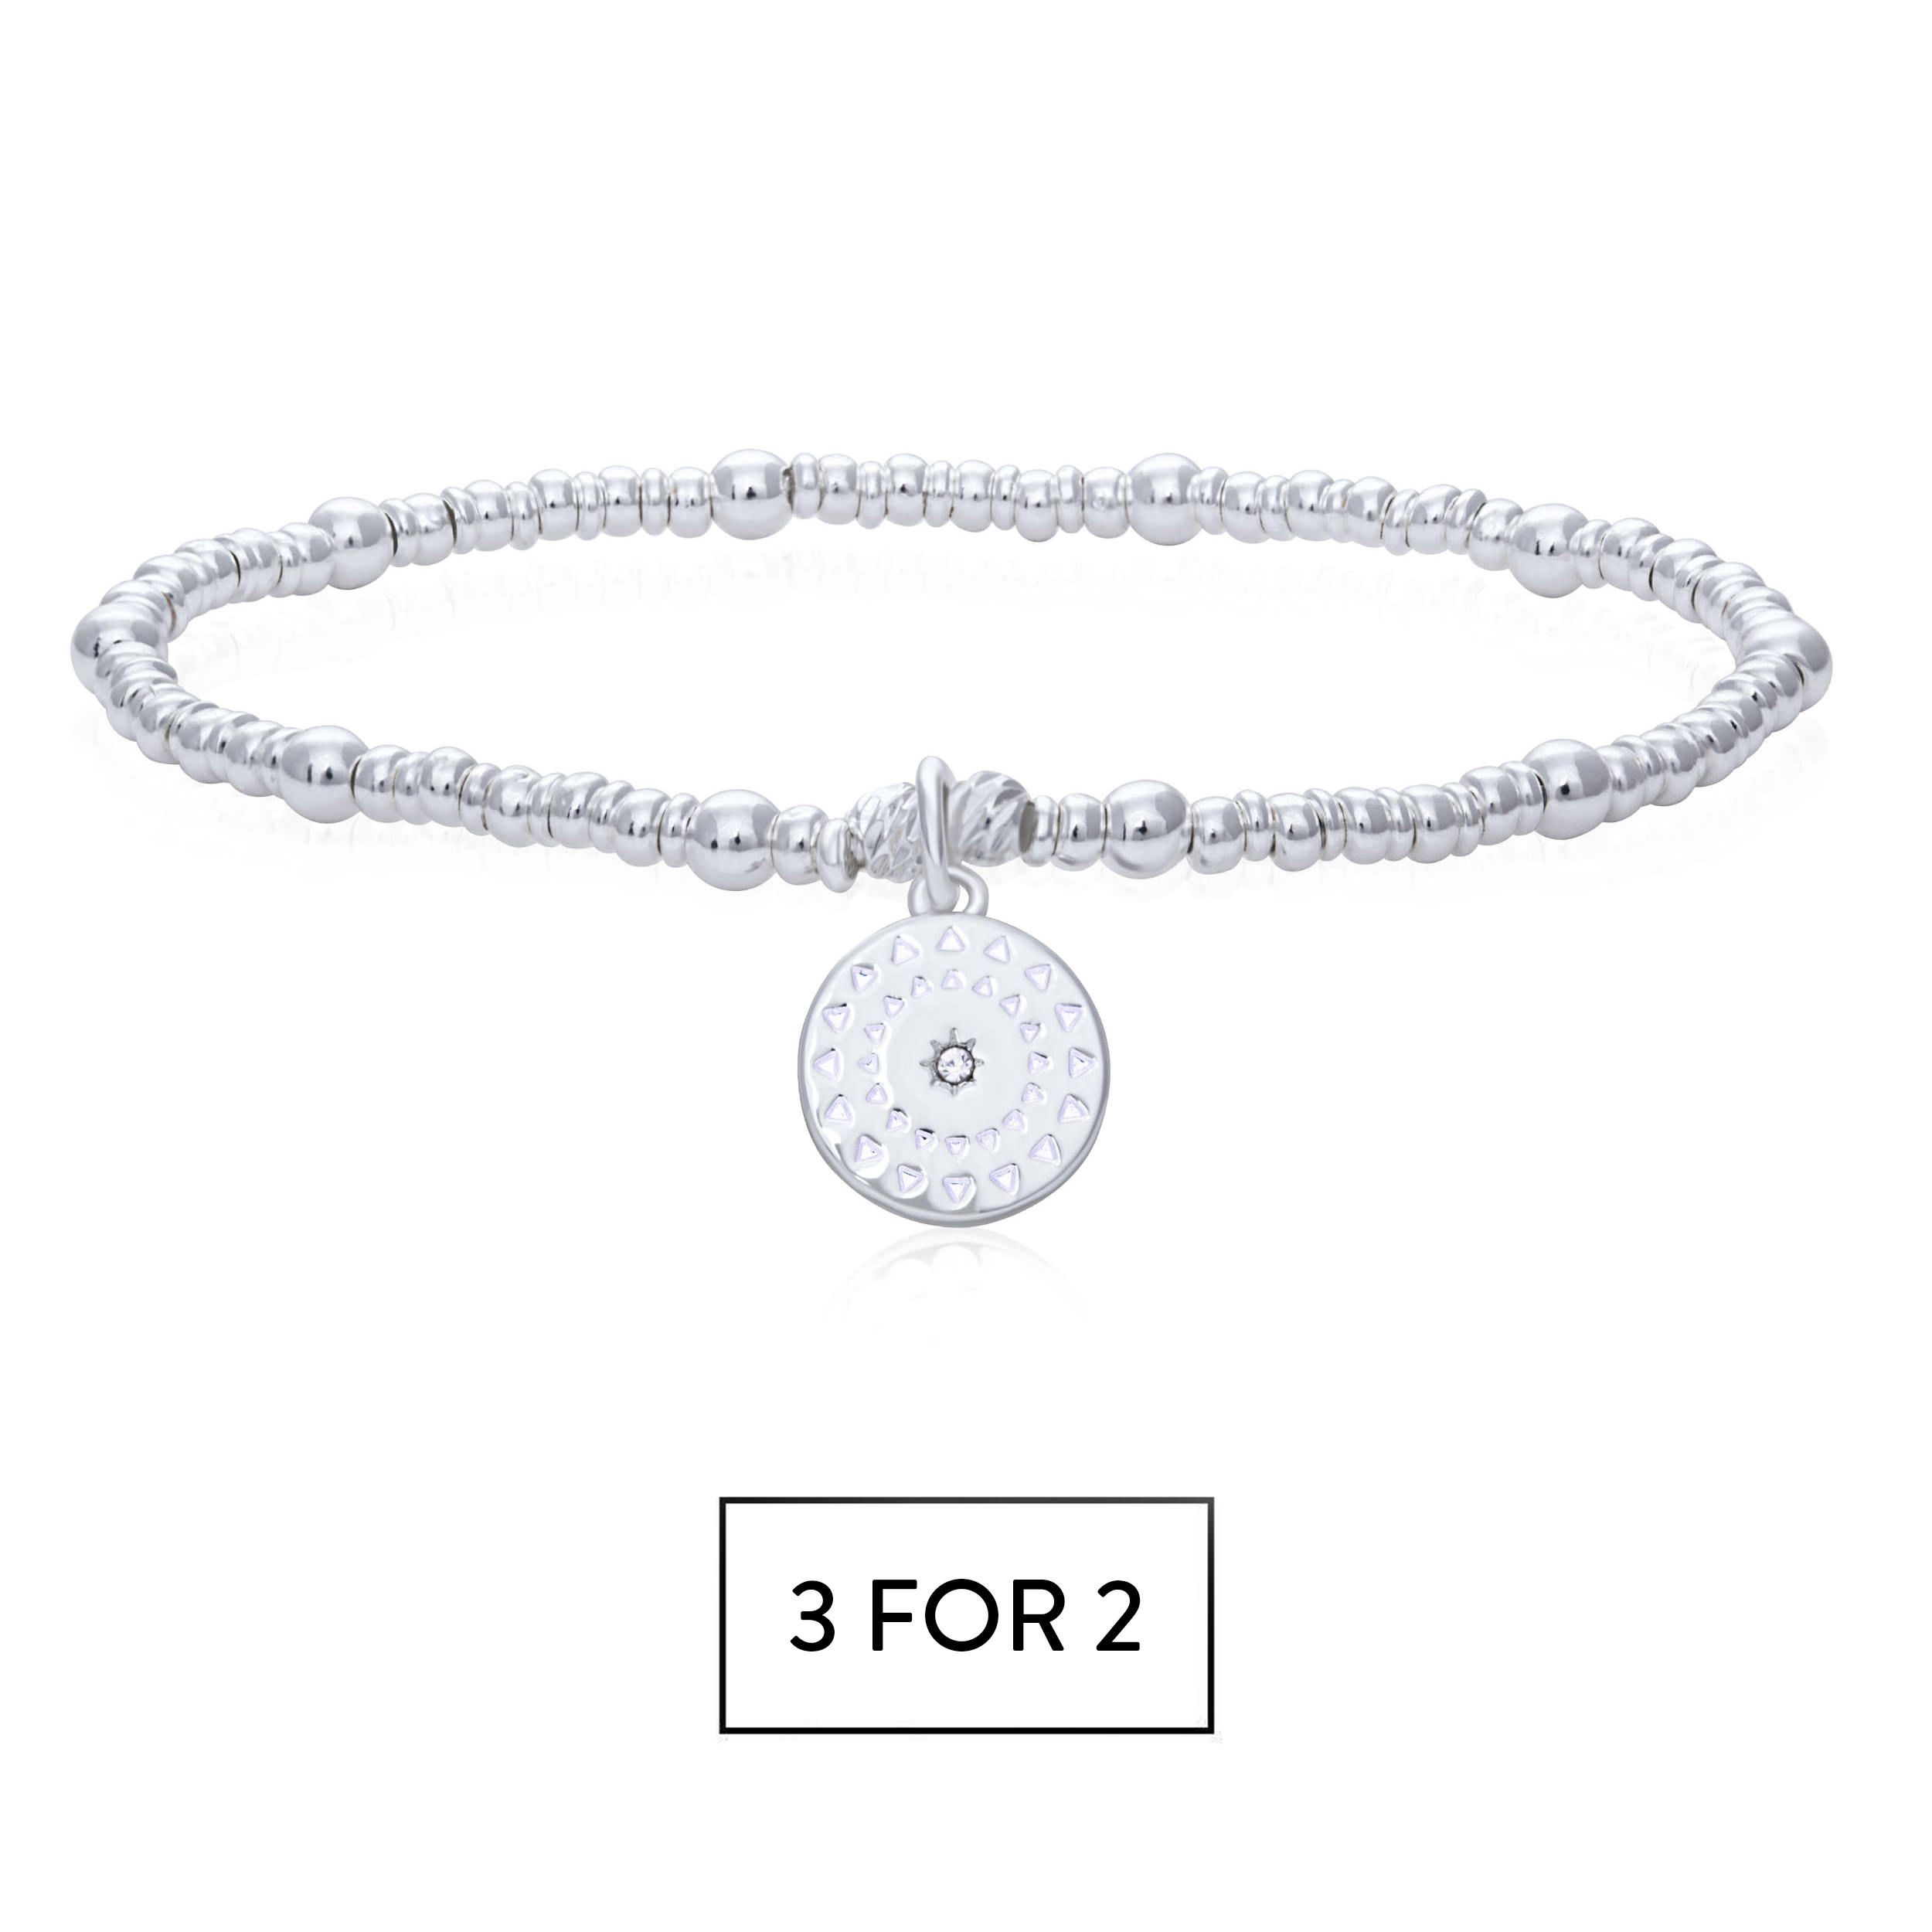 Buckley London Dreamcatcher Wish Bracelet